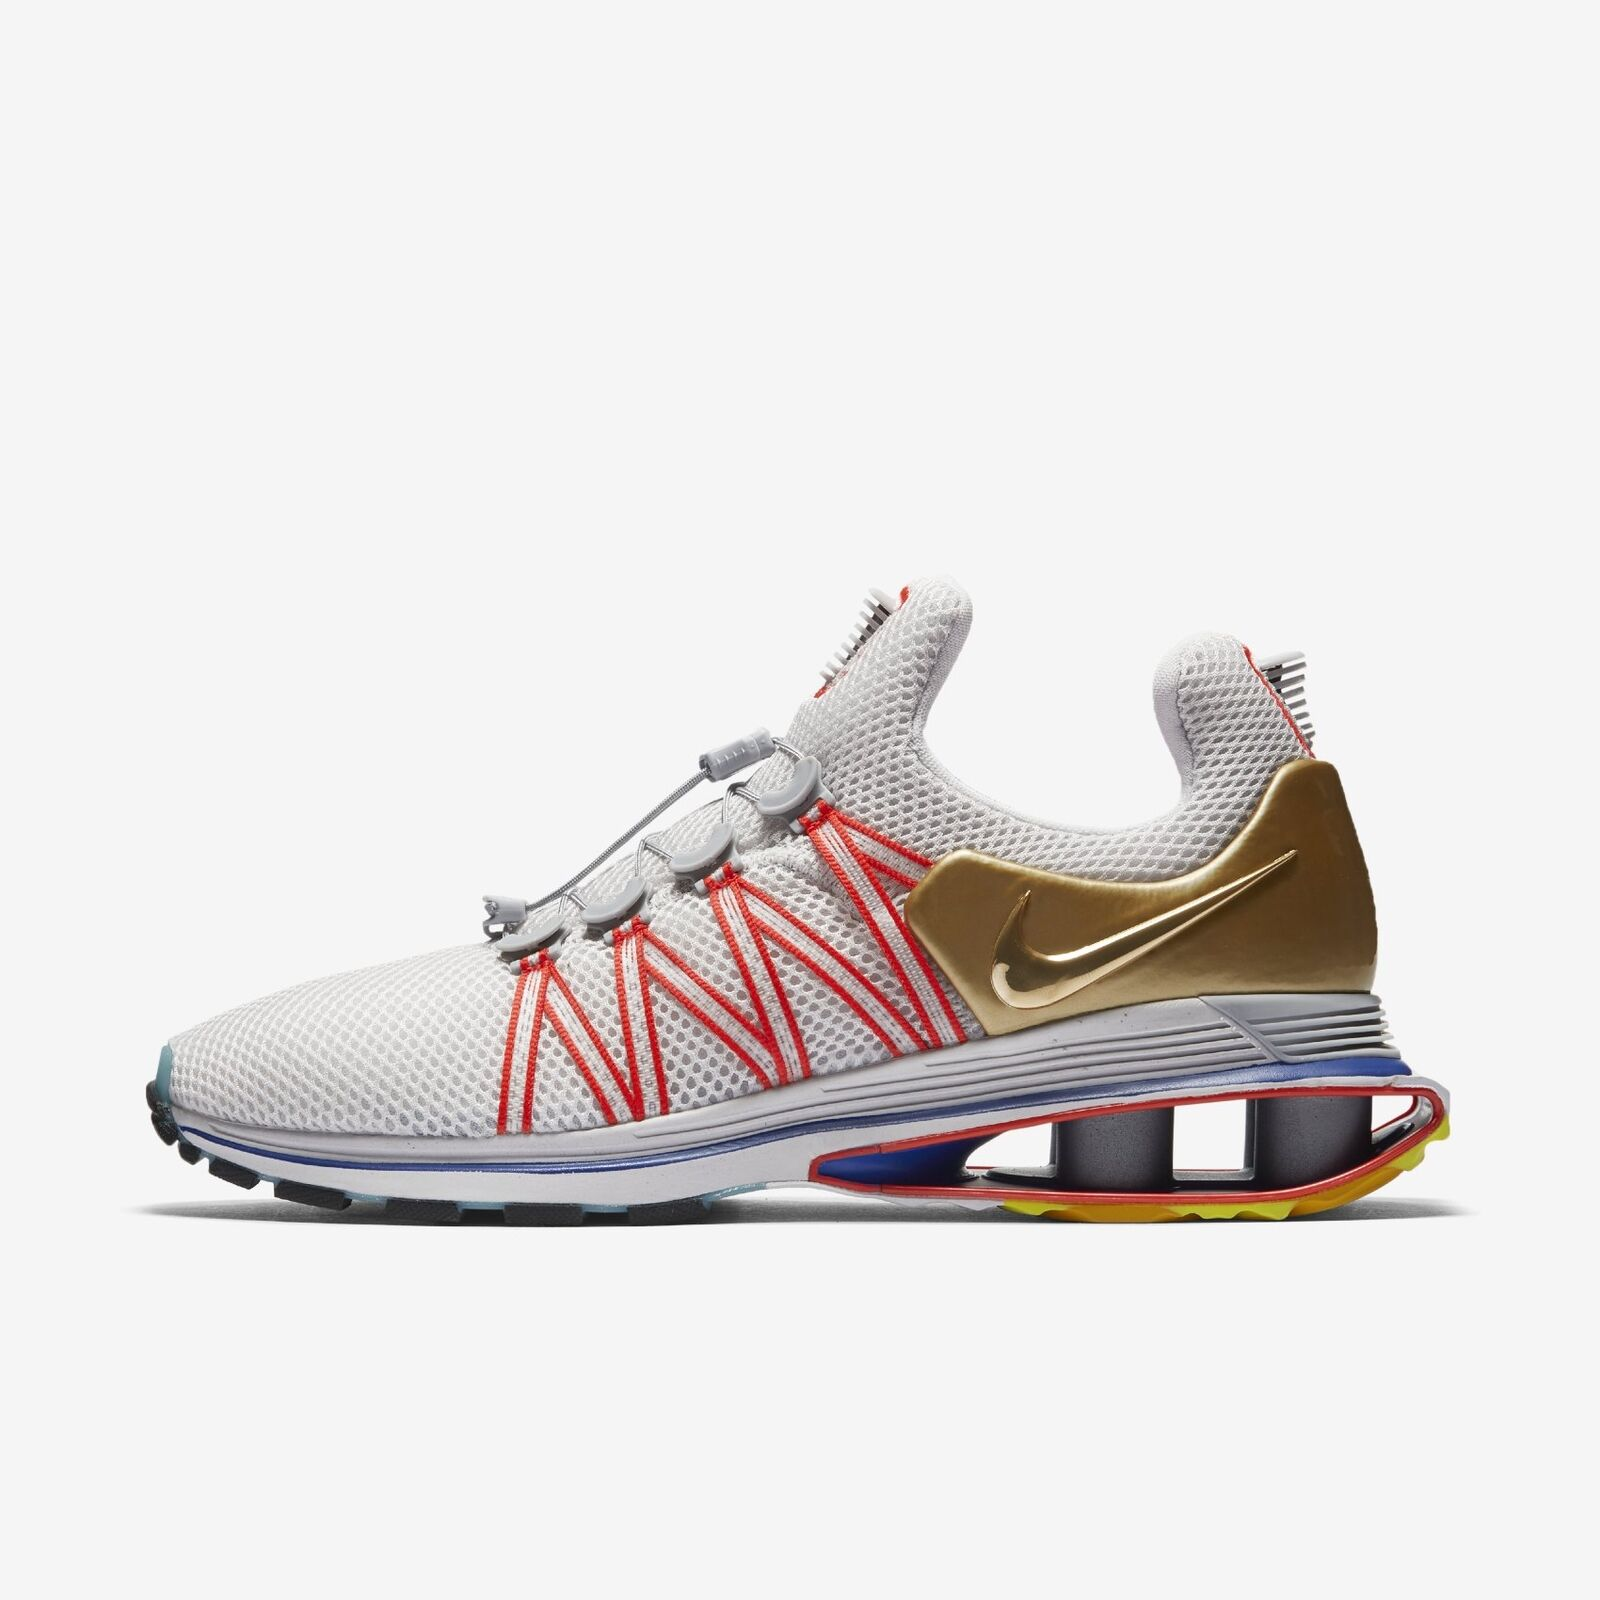 Men's Nike Shox Gravity shoes Vast Grey blueee Metallic gold Size 12 AQ8553 009